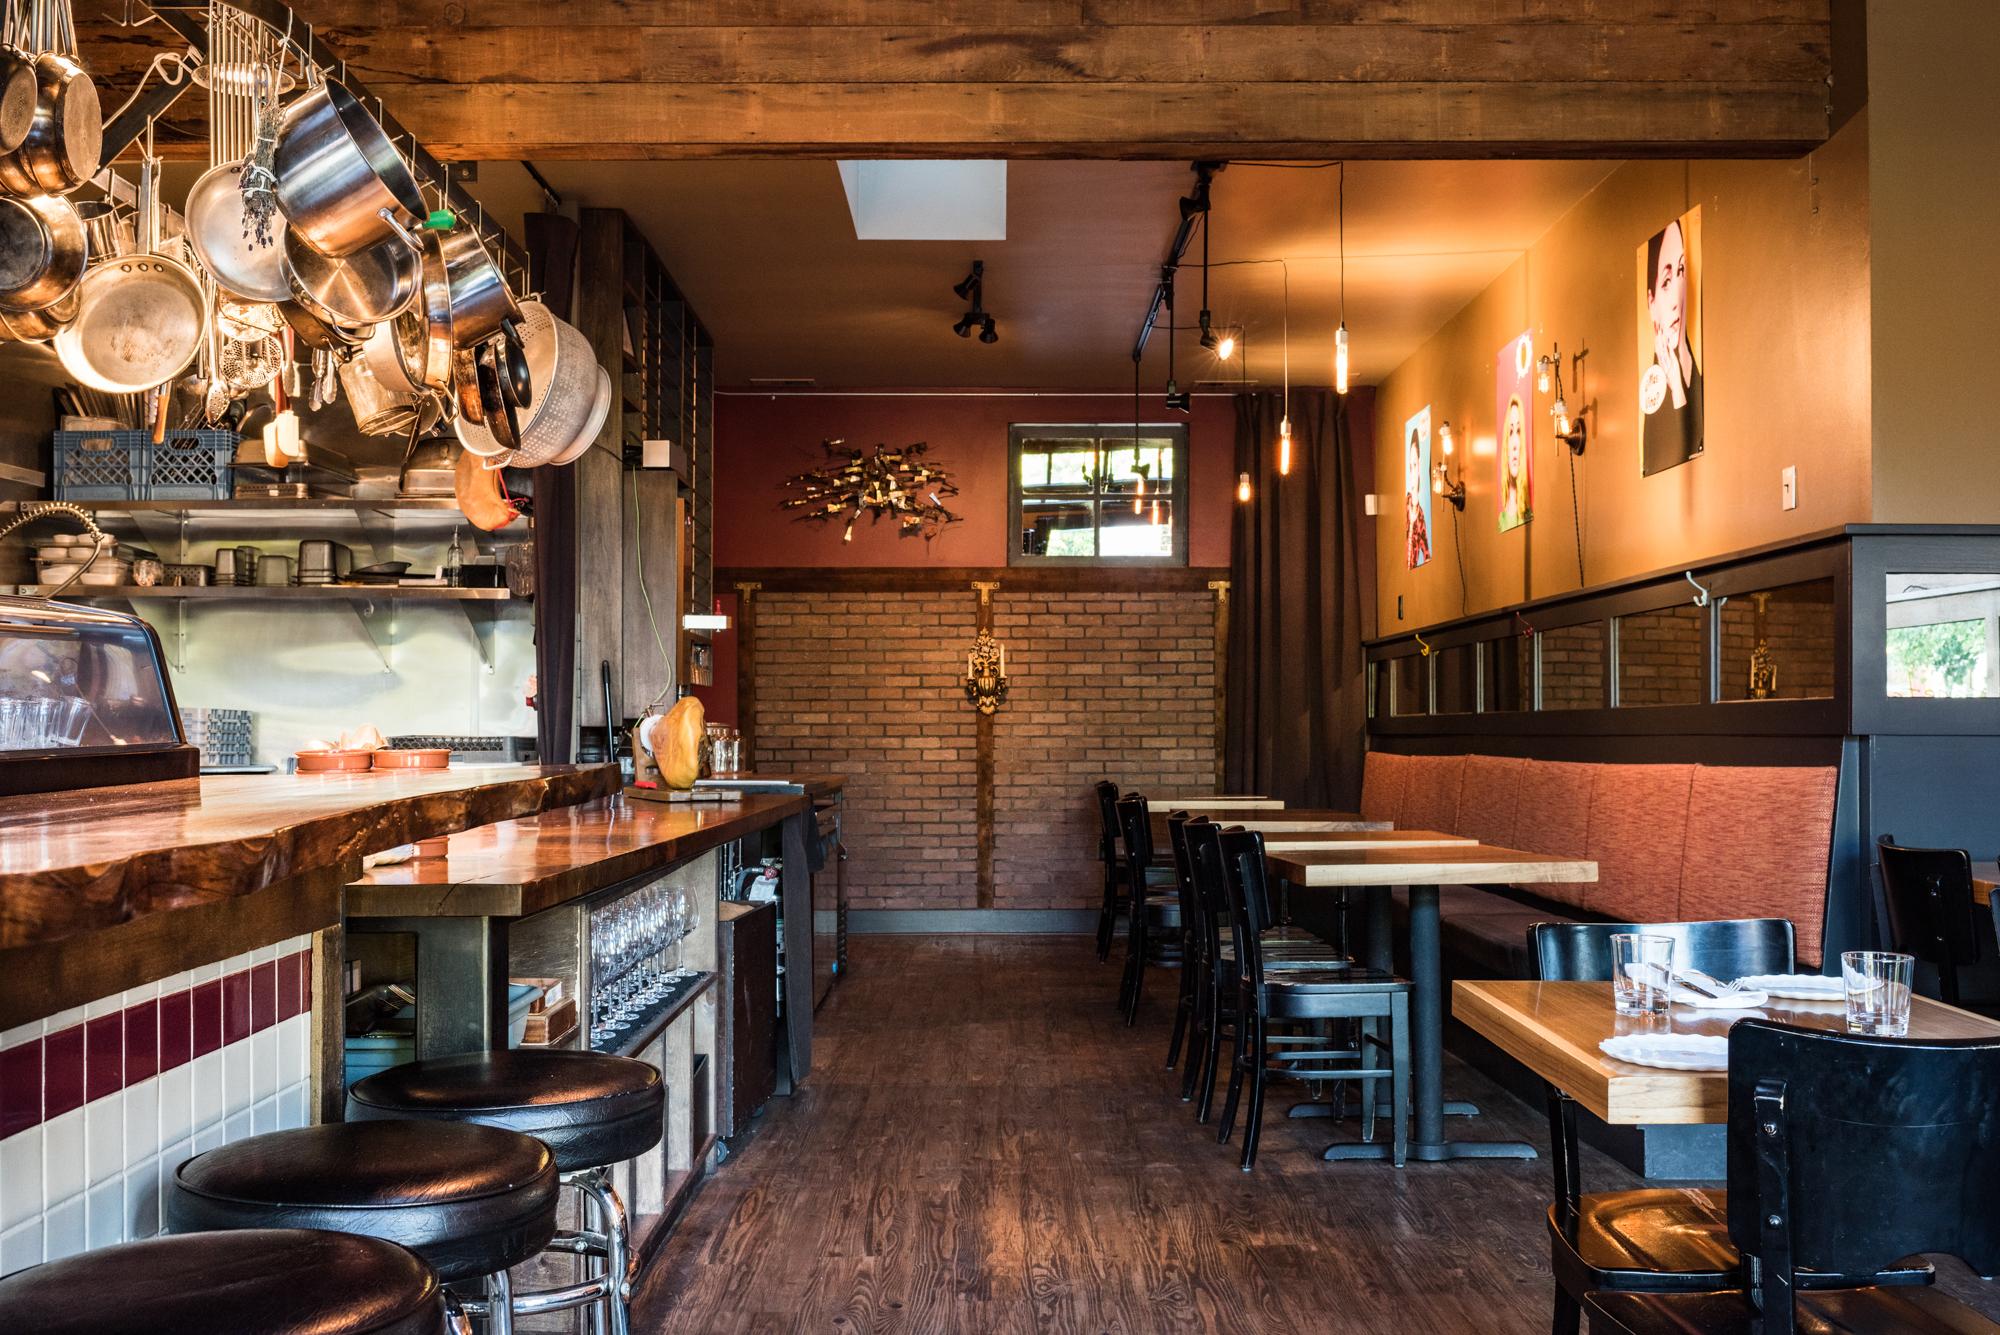 The dining room of the Spanish restaurant Urdaneta